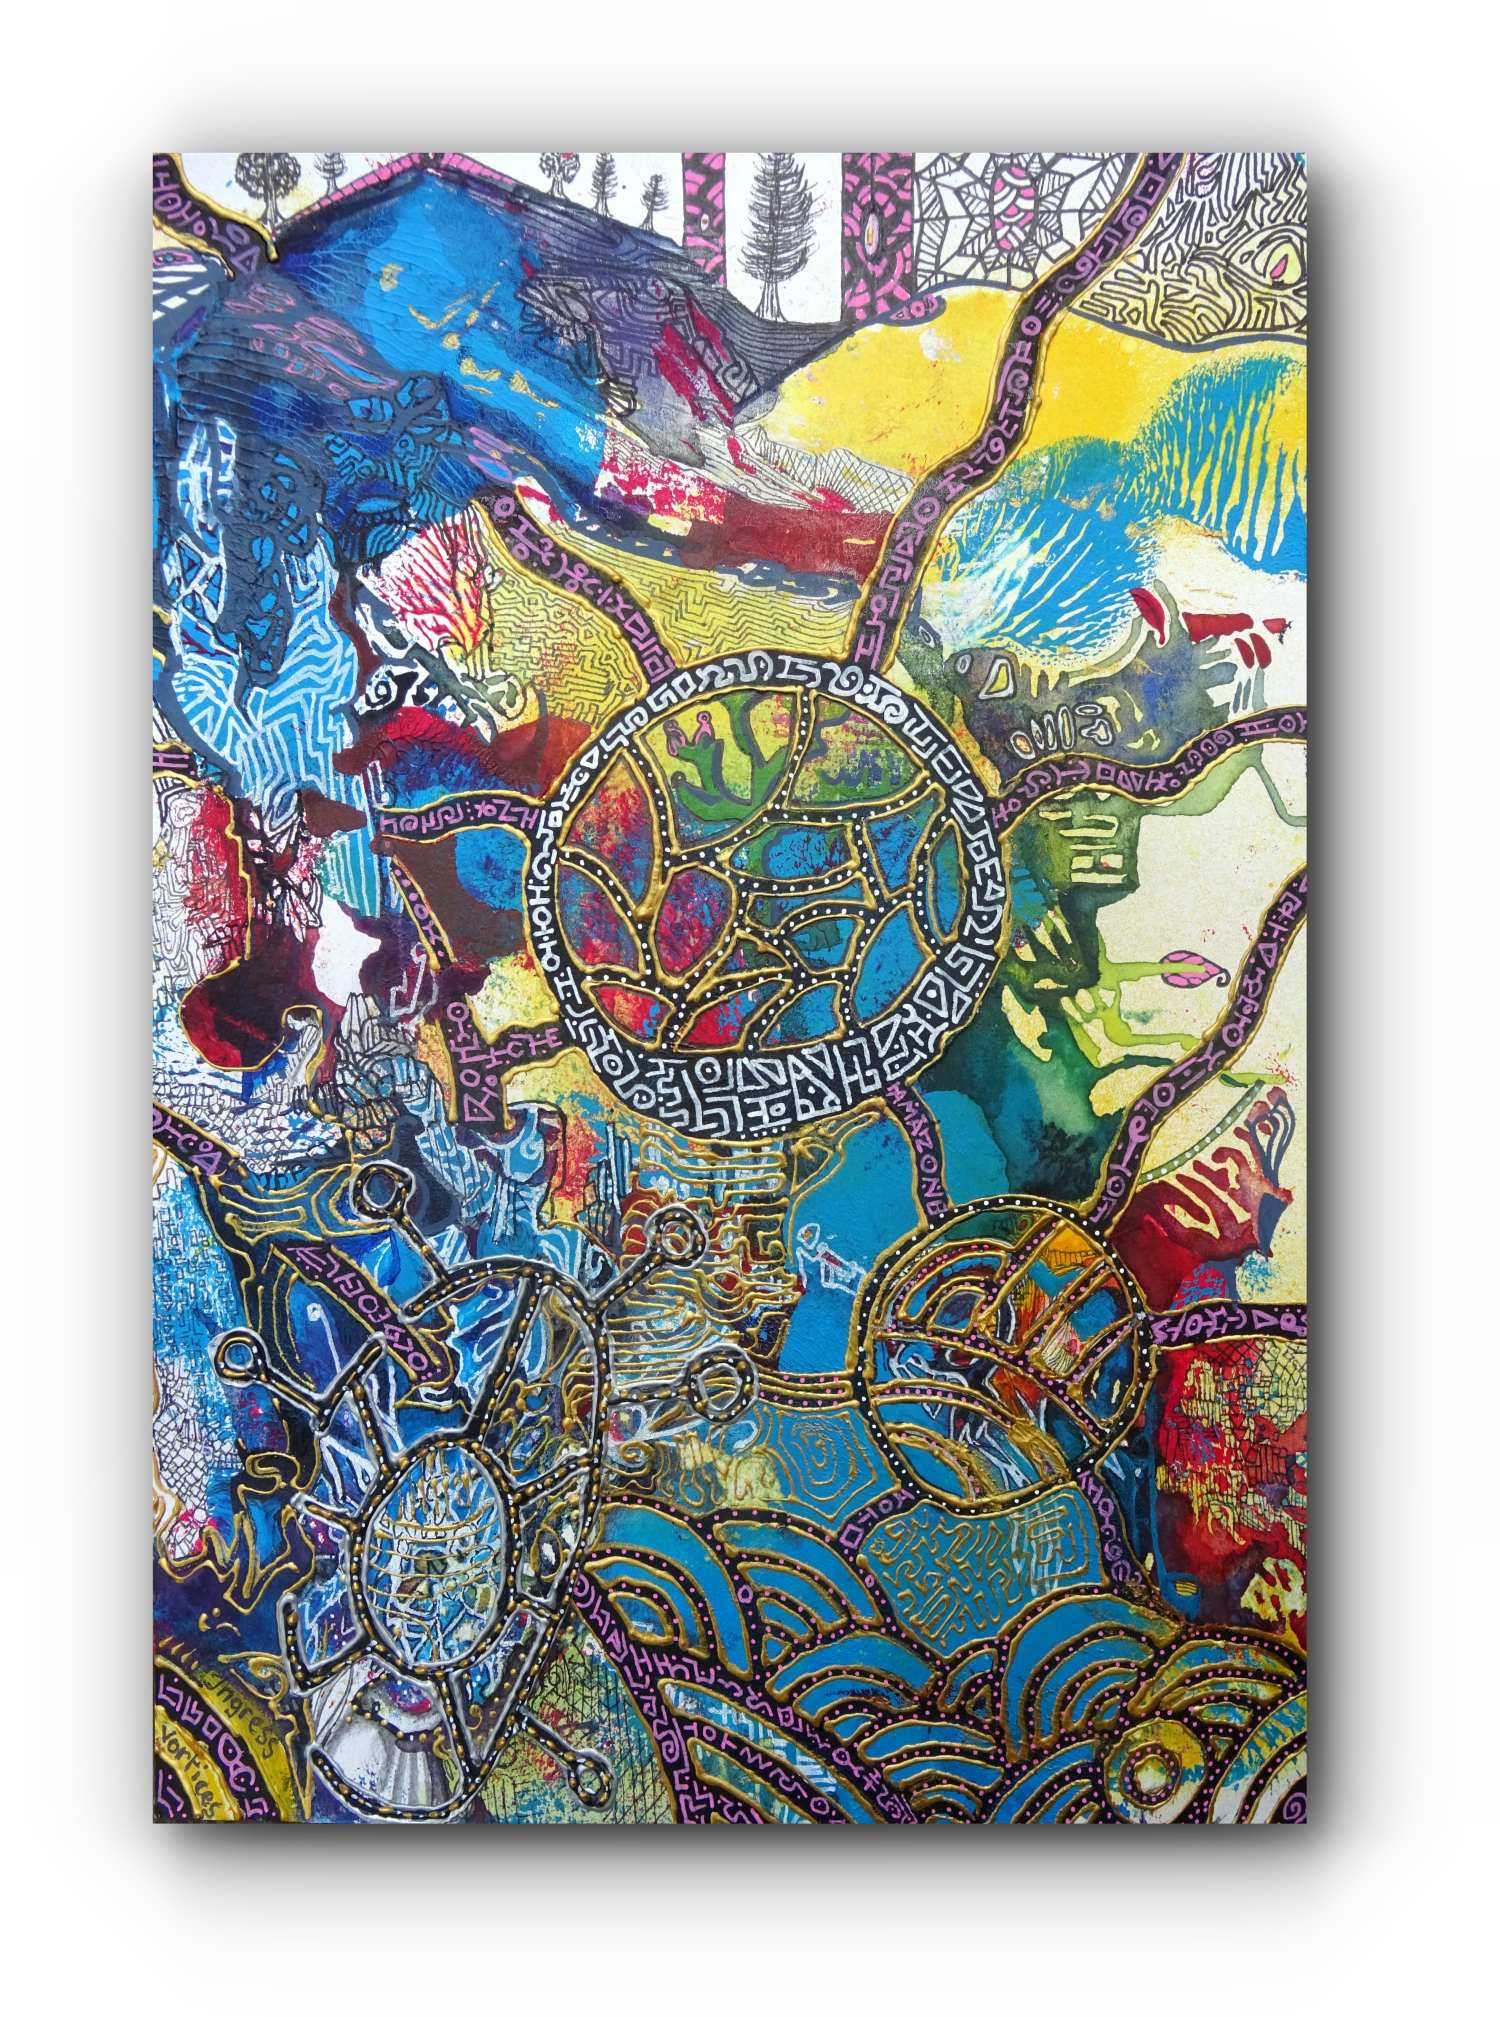 painting-amazon-atoms-artist-duo-ingress-vortices.jpg